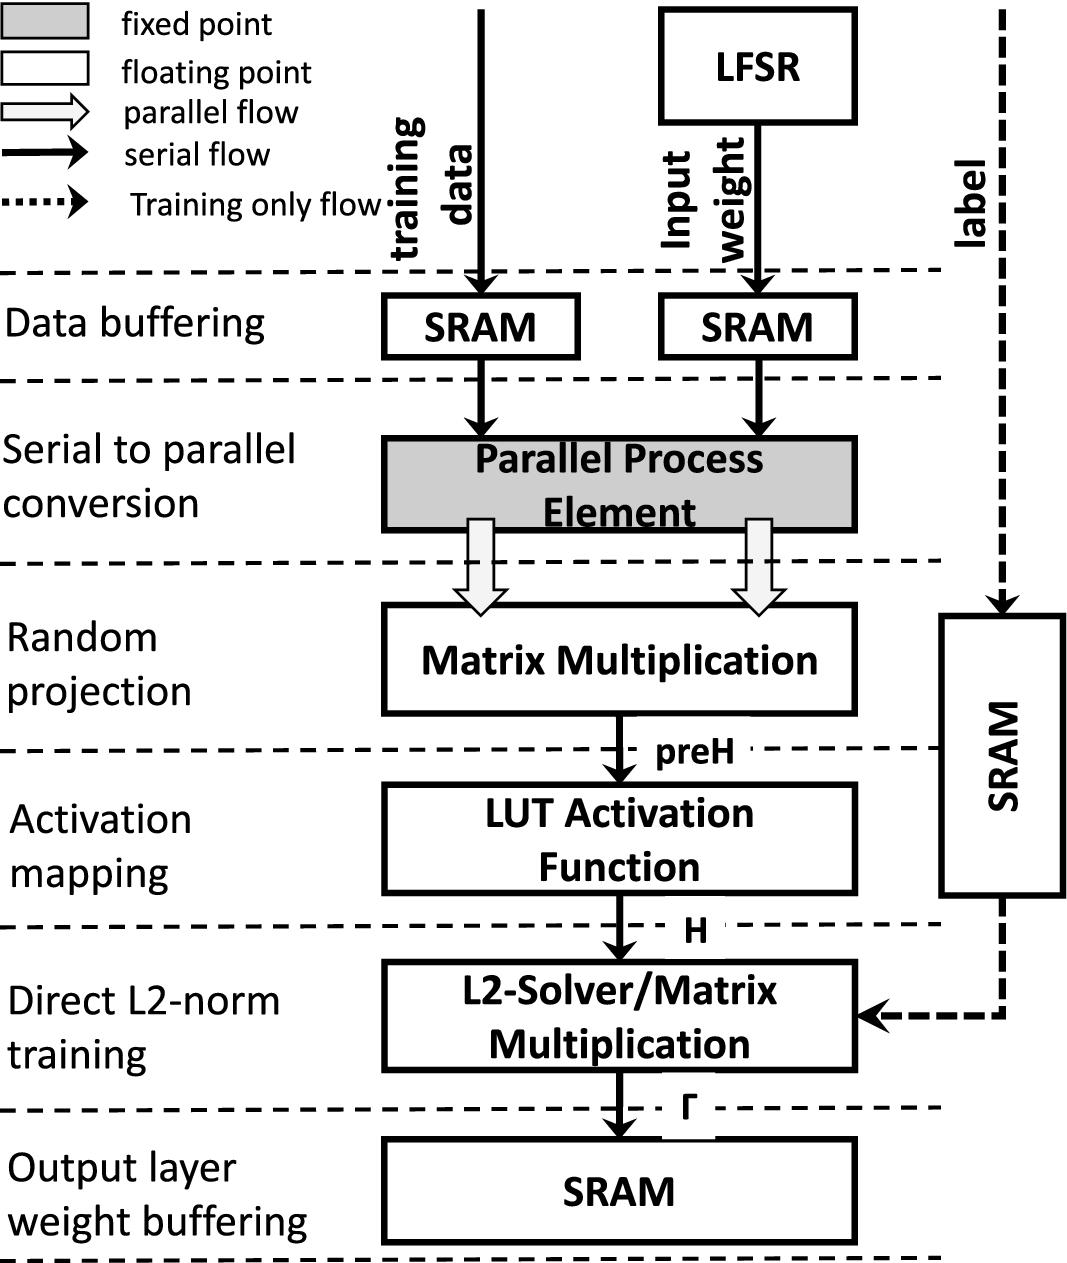 Least-Squares-Solver for Shallow Neural Network | SpringerLink